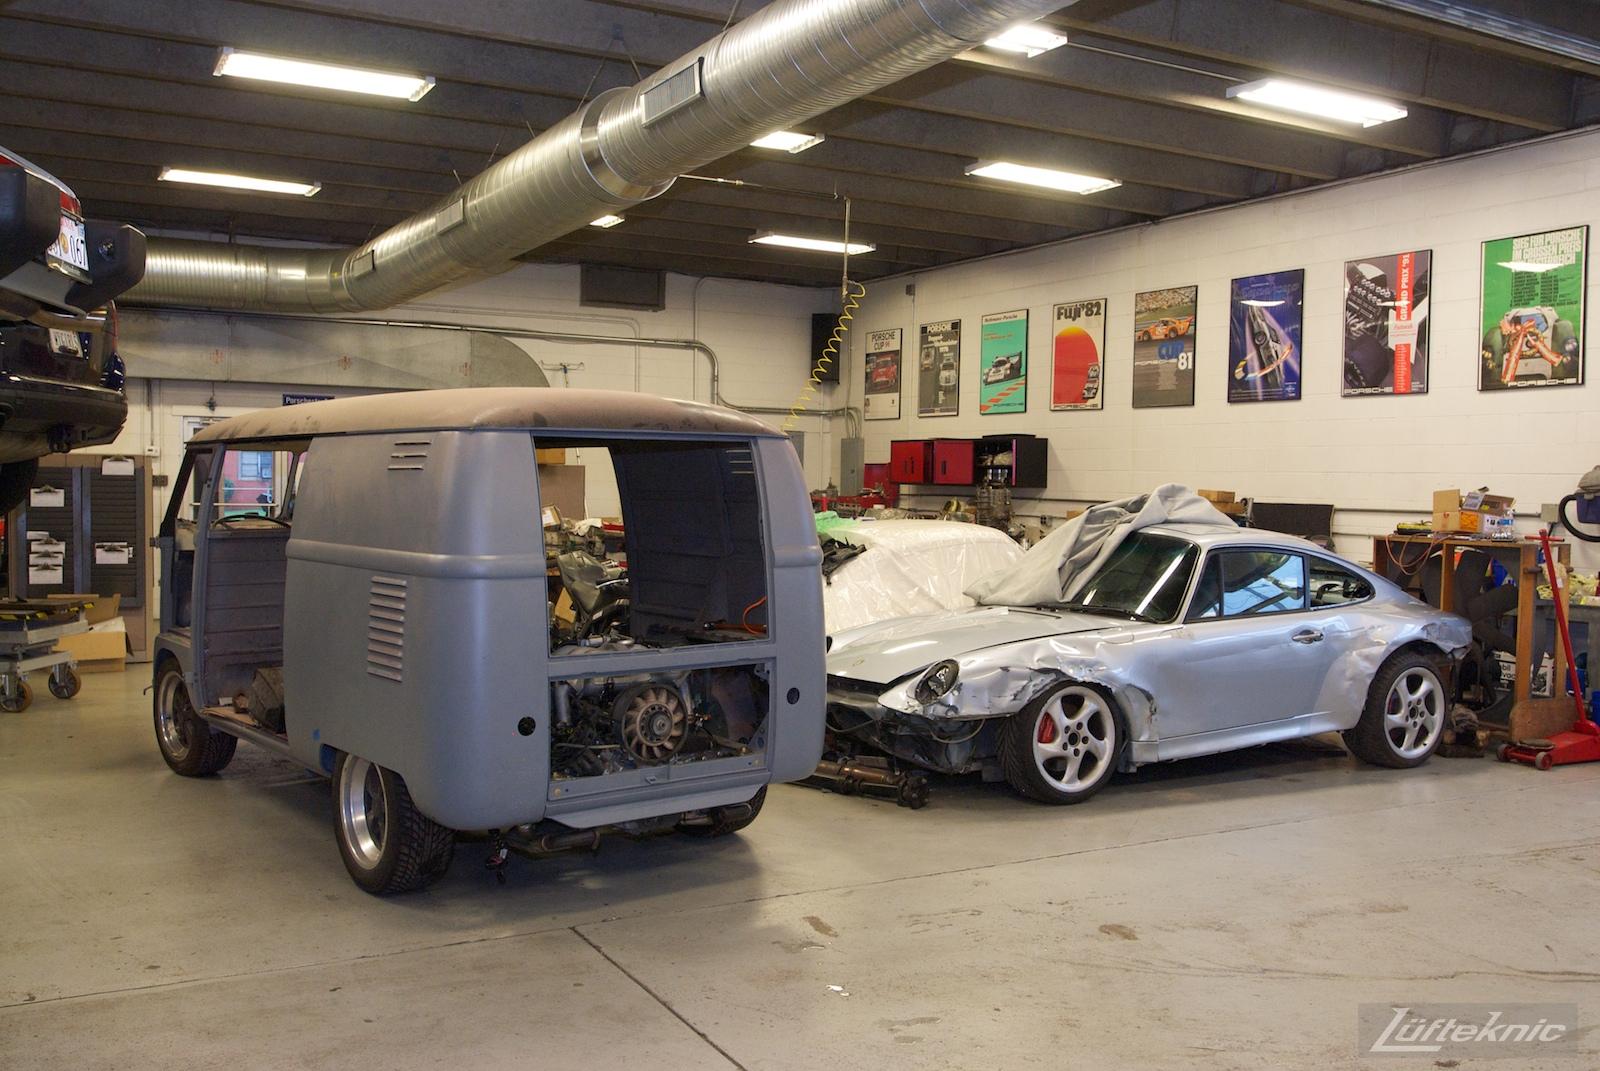 1956 Volkswagen double panel Transporter Porsche Bus with engine installed.